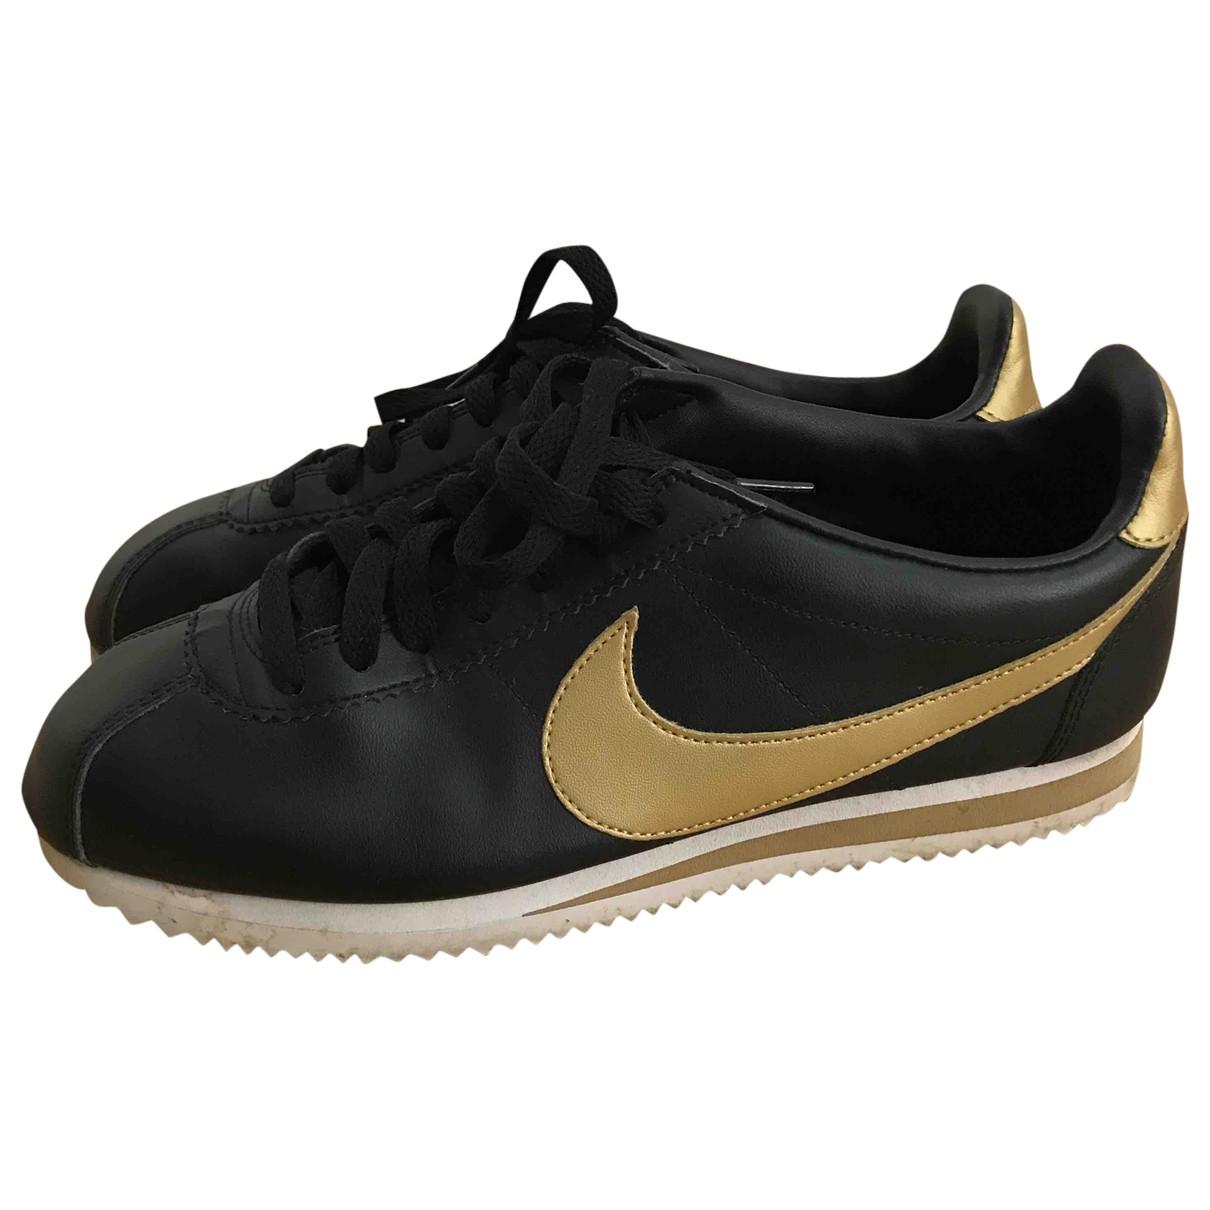 Nike Cortez Black Leather Trainers for Women 41 EU